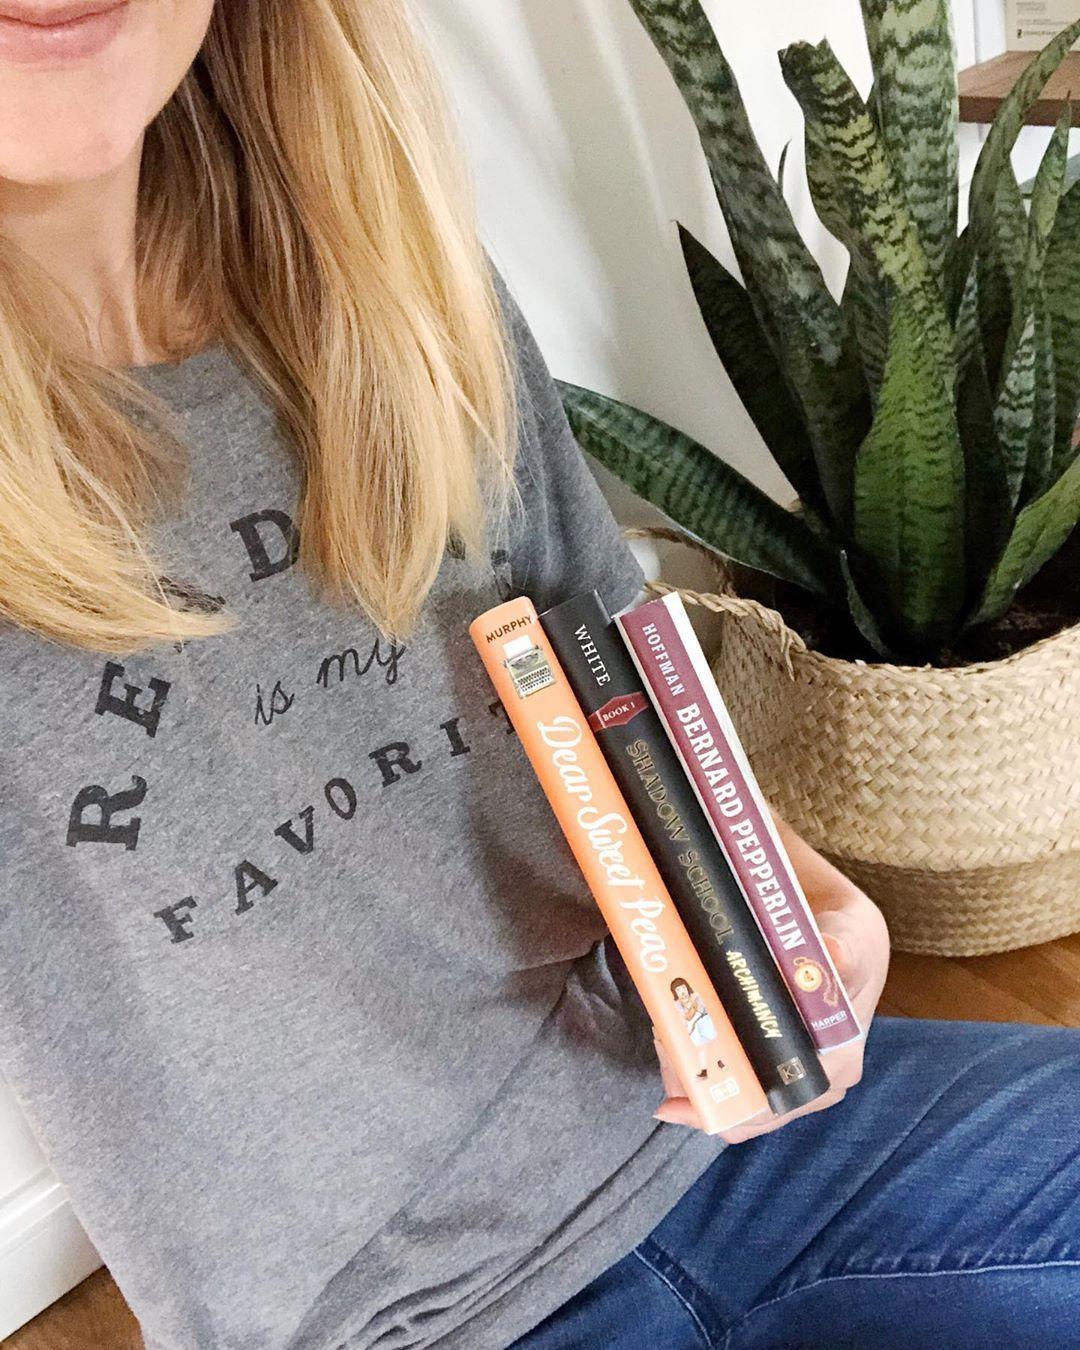 Books shown dear sweet pea by julie murphy bernard